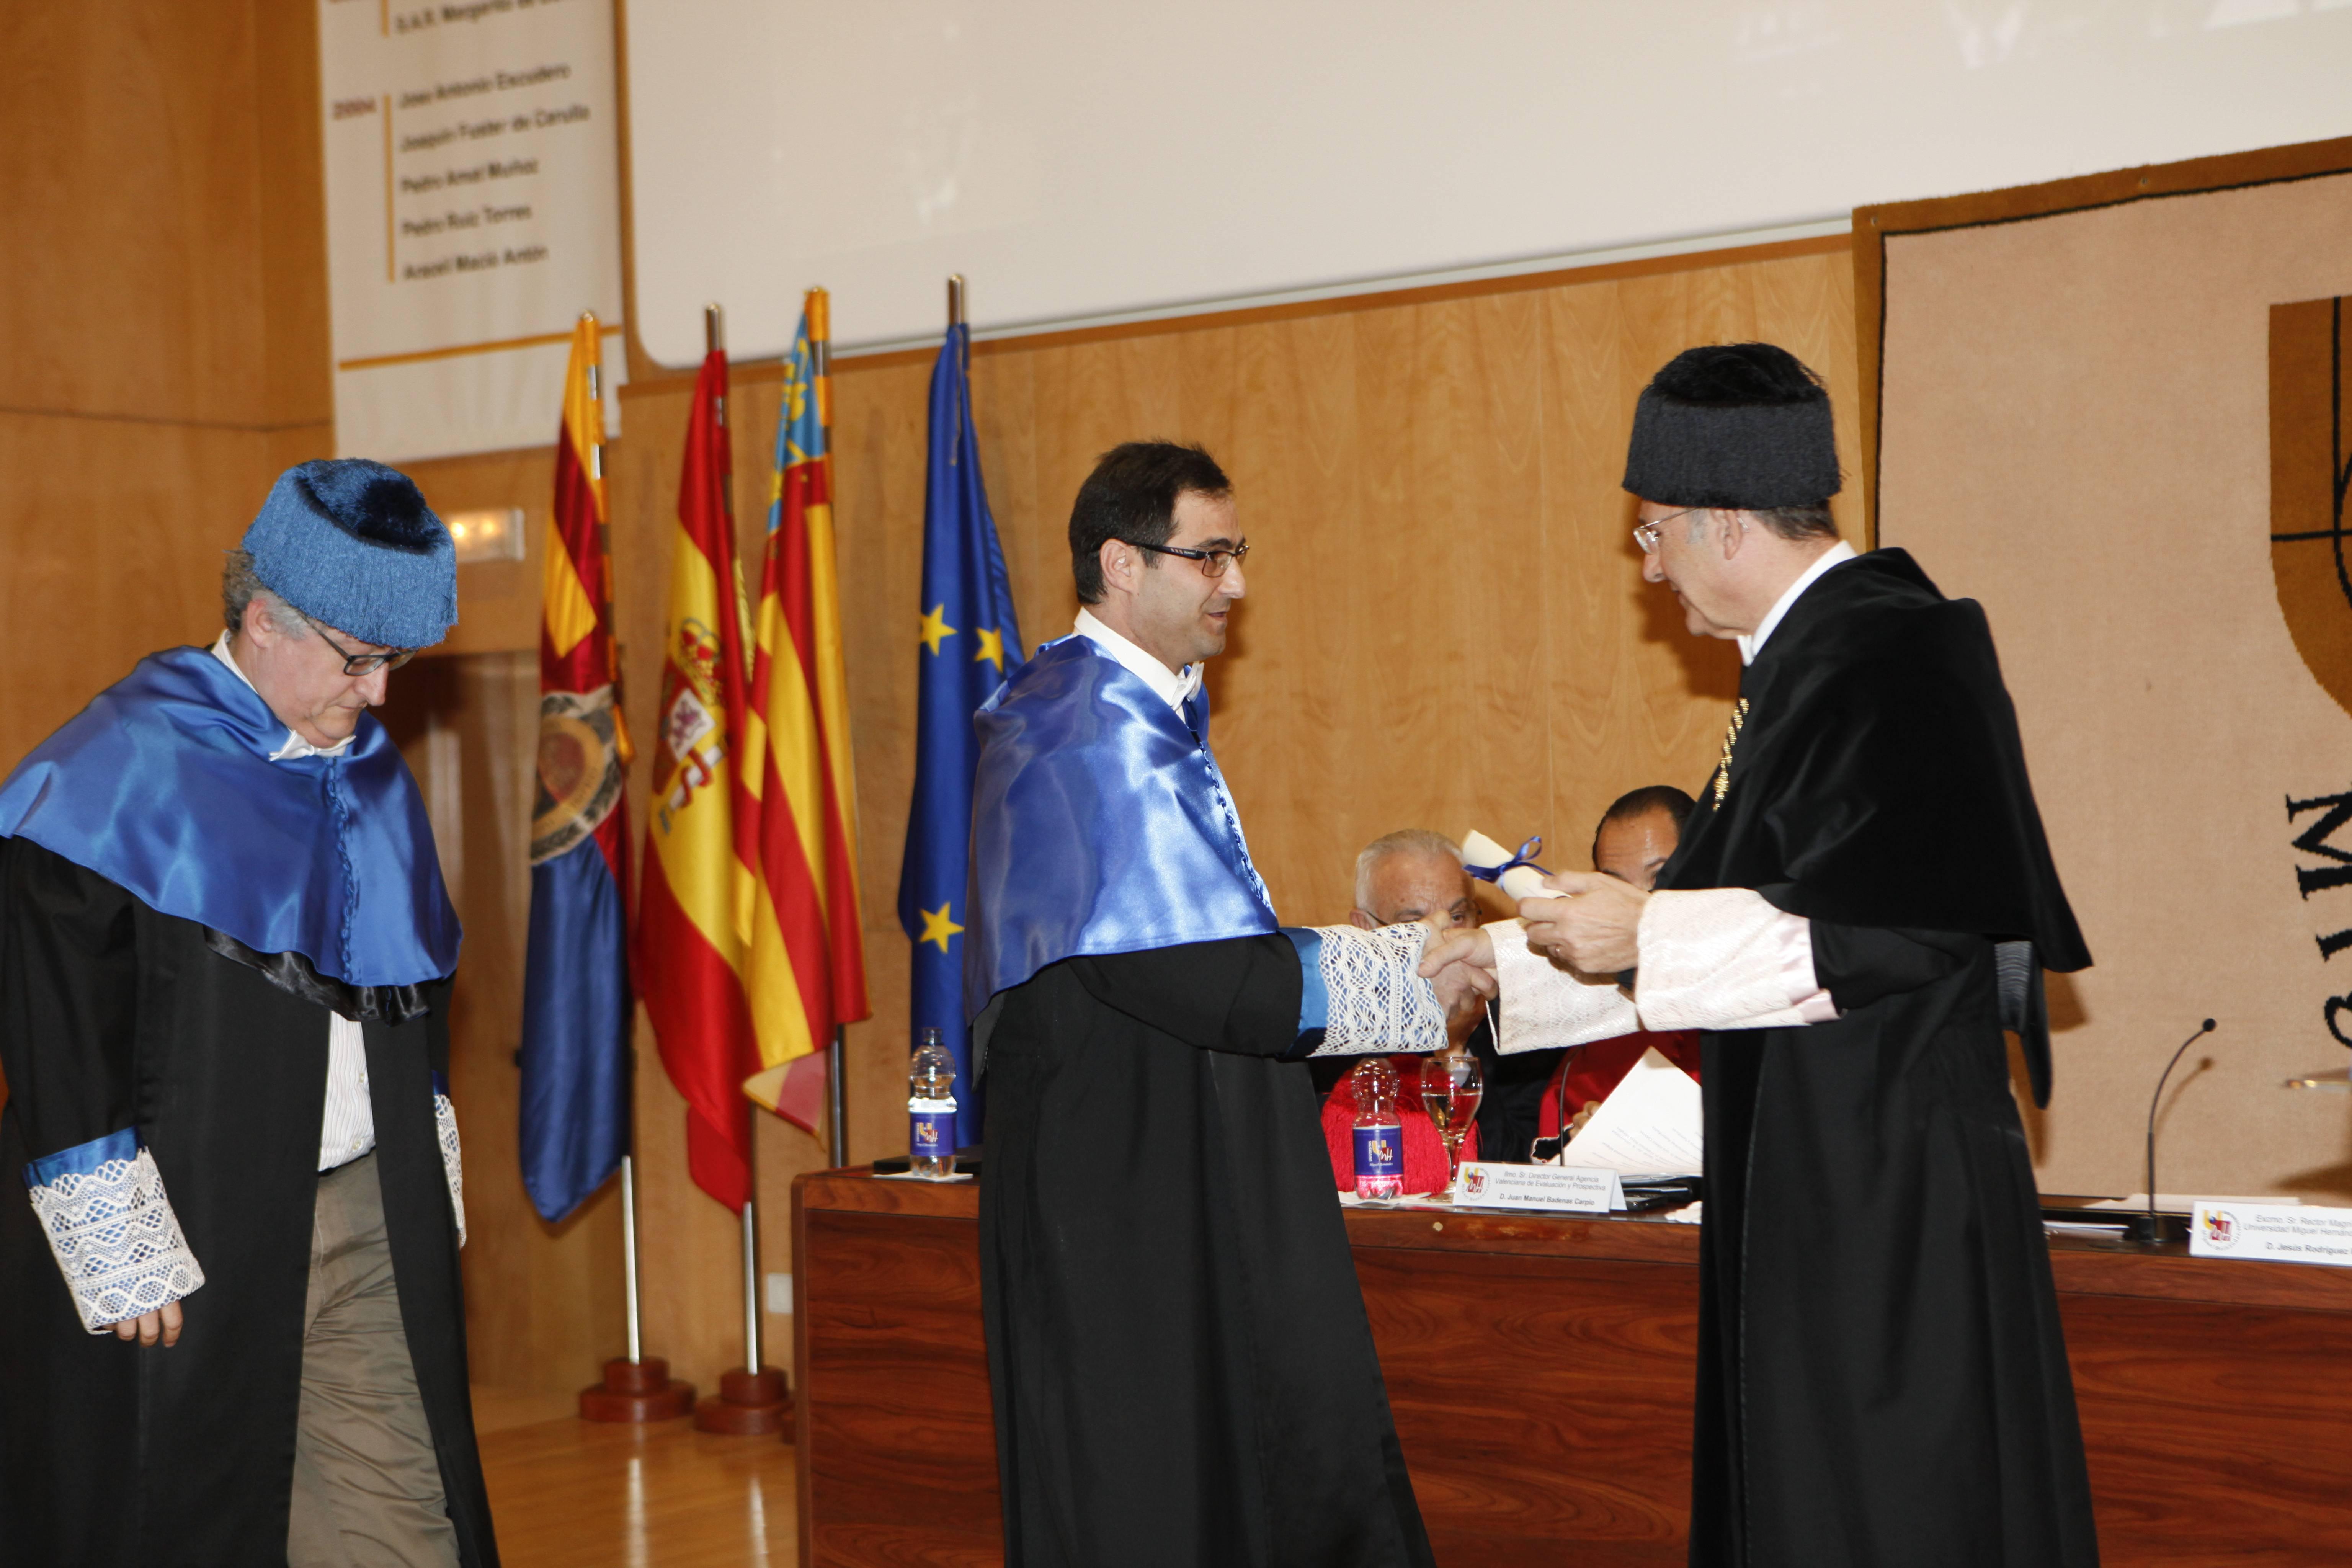 doctor-honoris-causa-luis-gamir_mg_1135.jpg